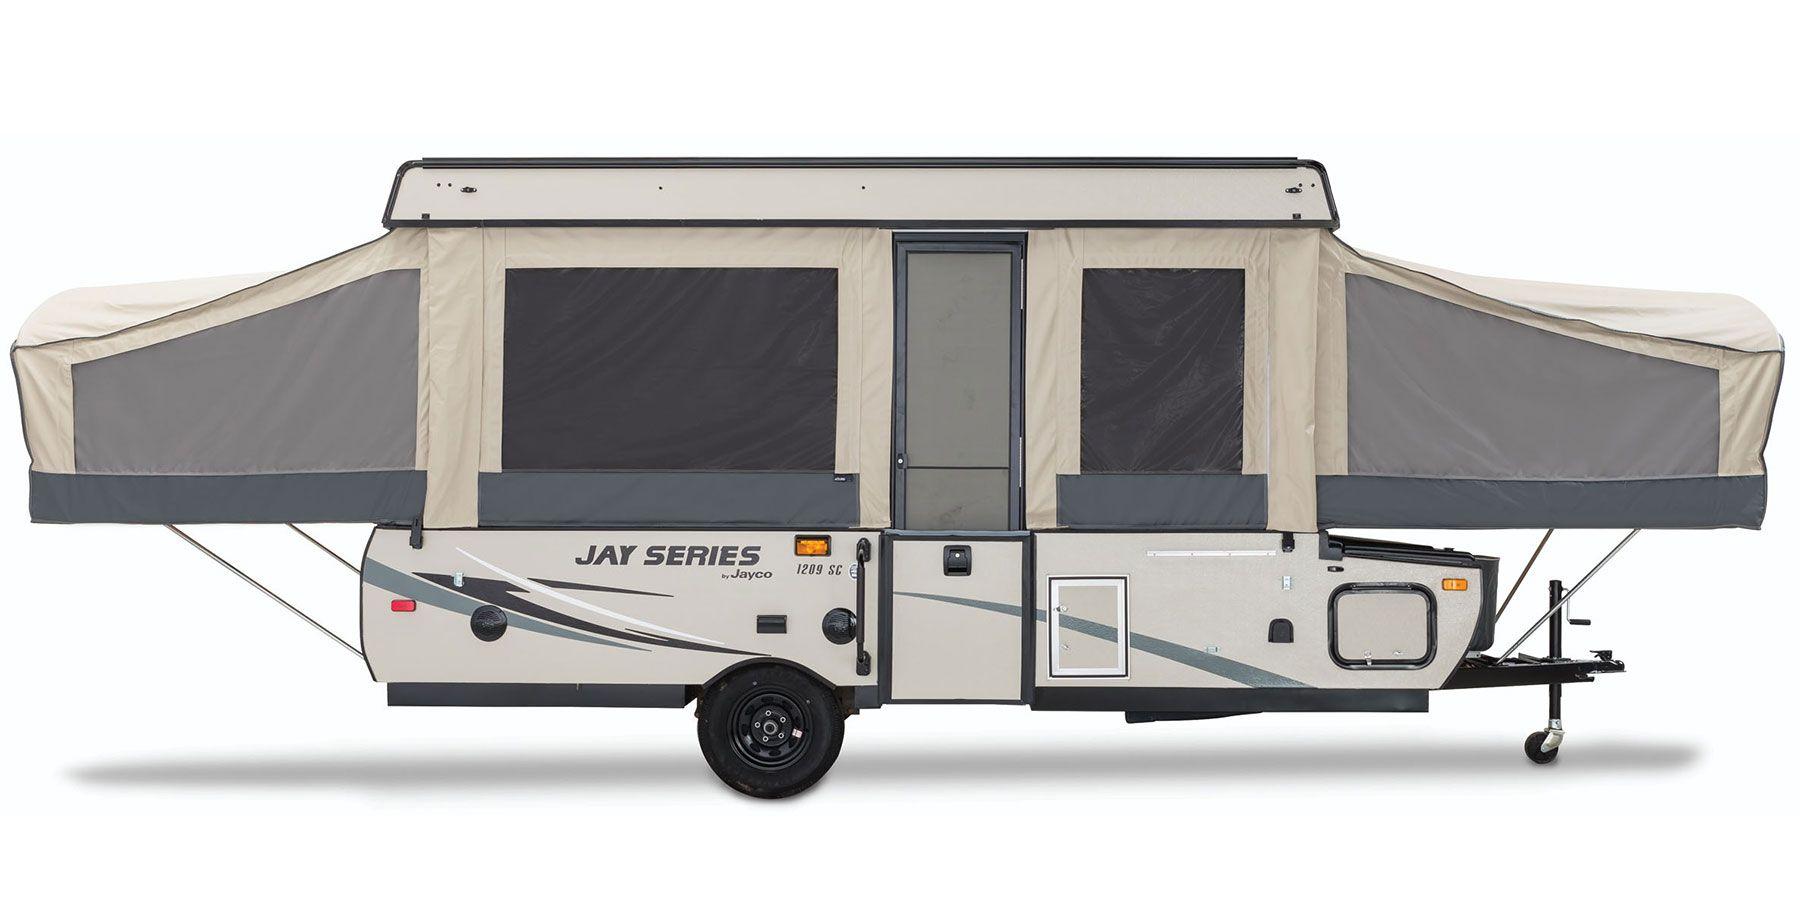 Jayco Jay Series Pop Up Campers